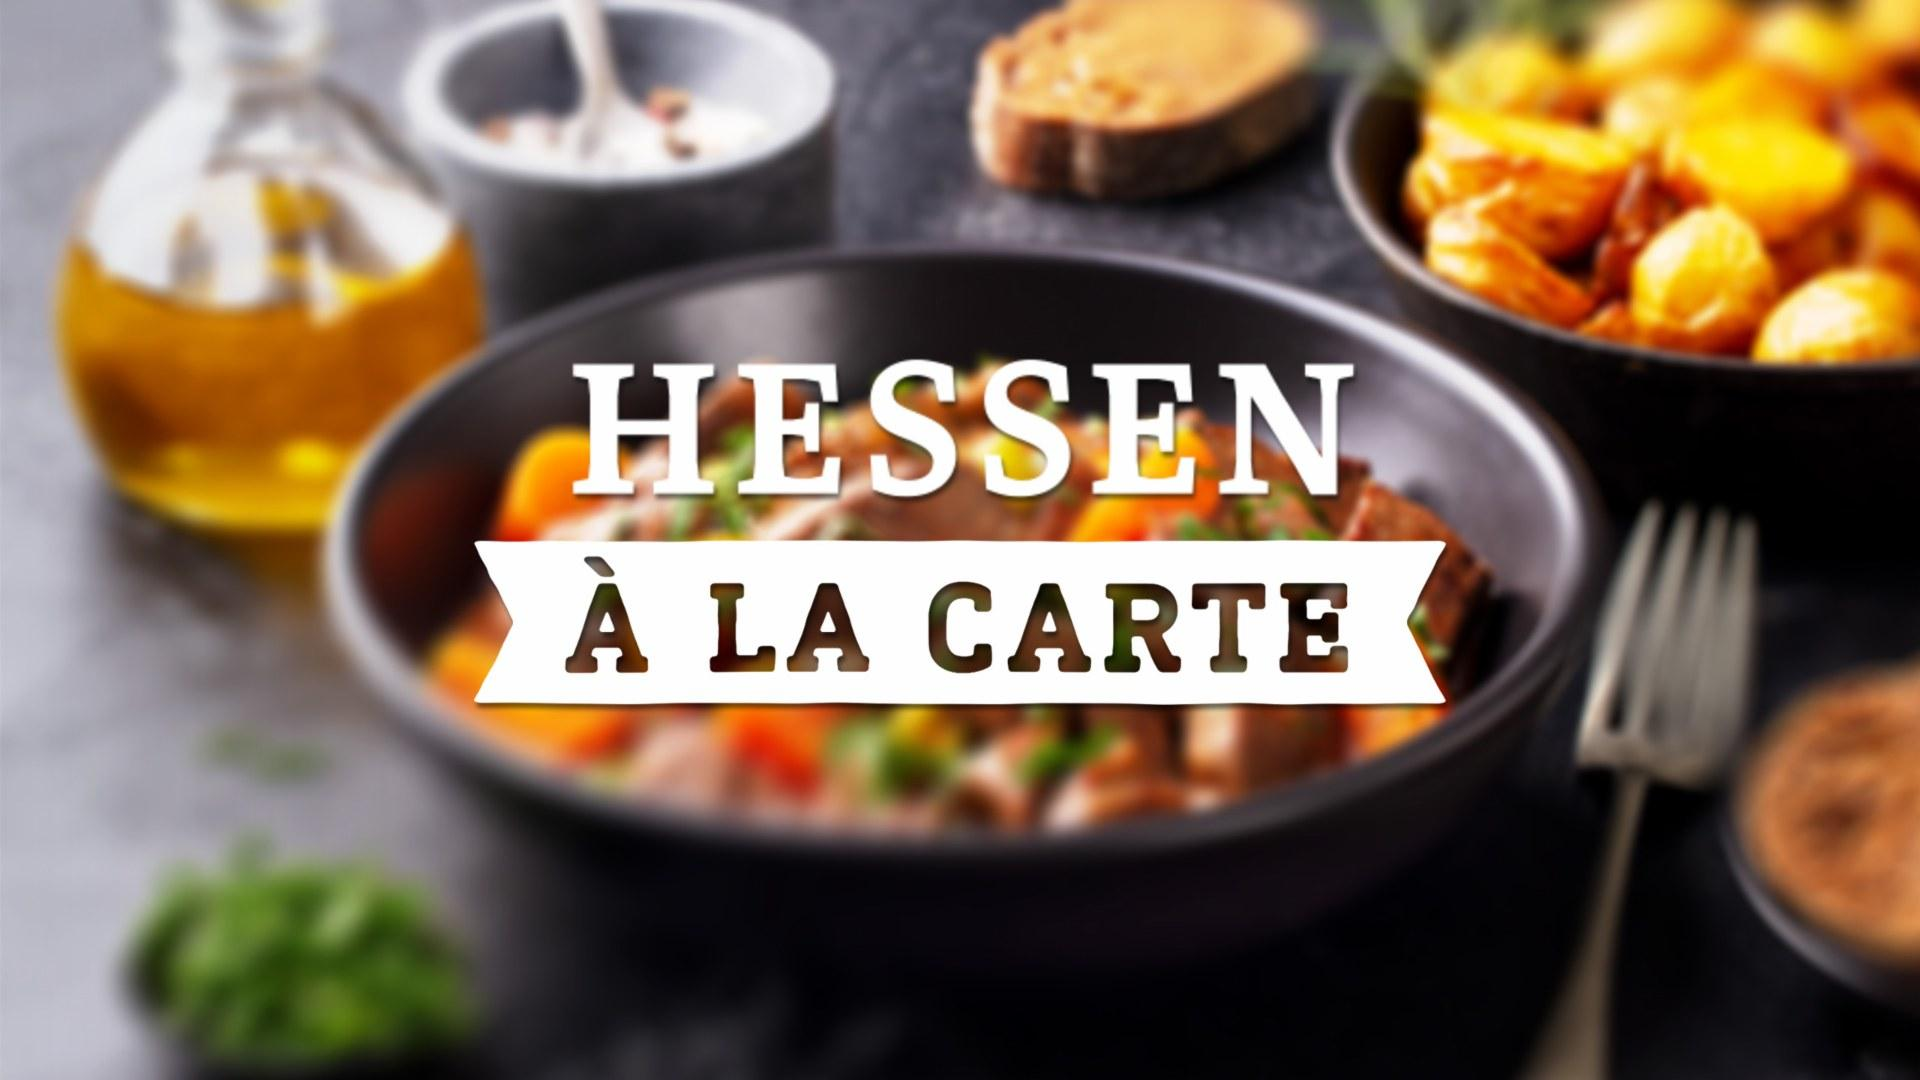 Hessen A La Carte